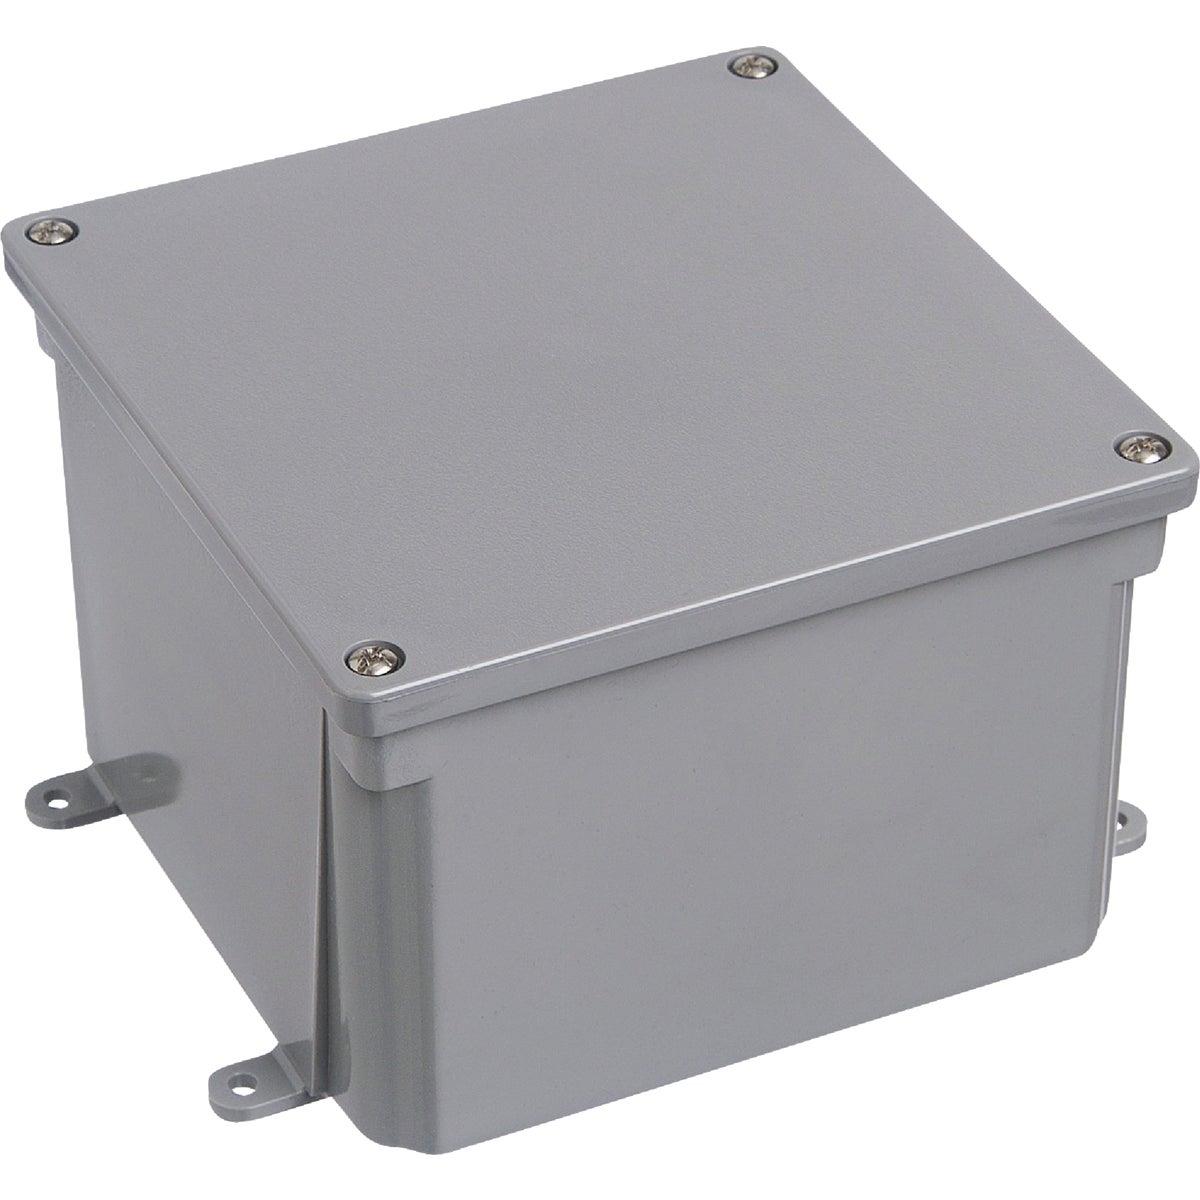 6X6X4 JUNCTION BOX